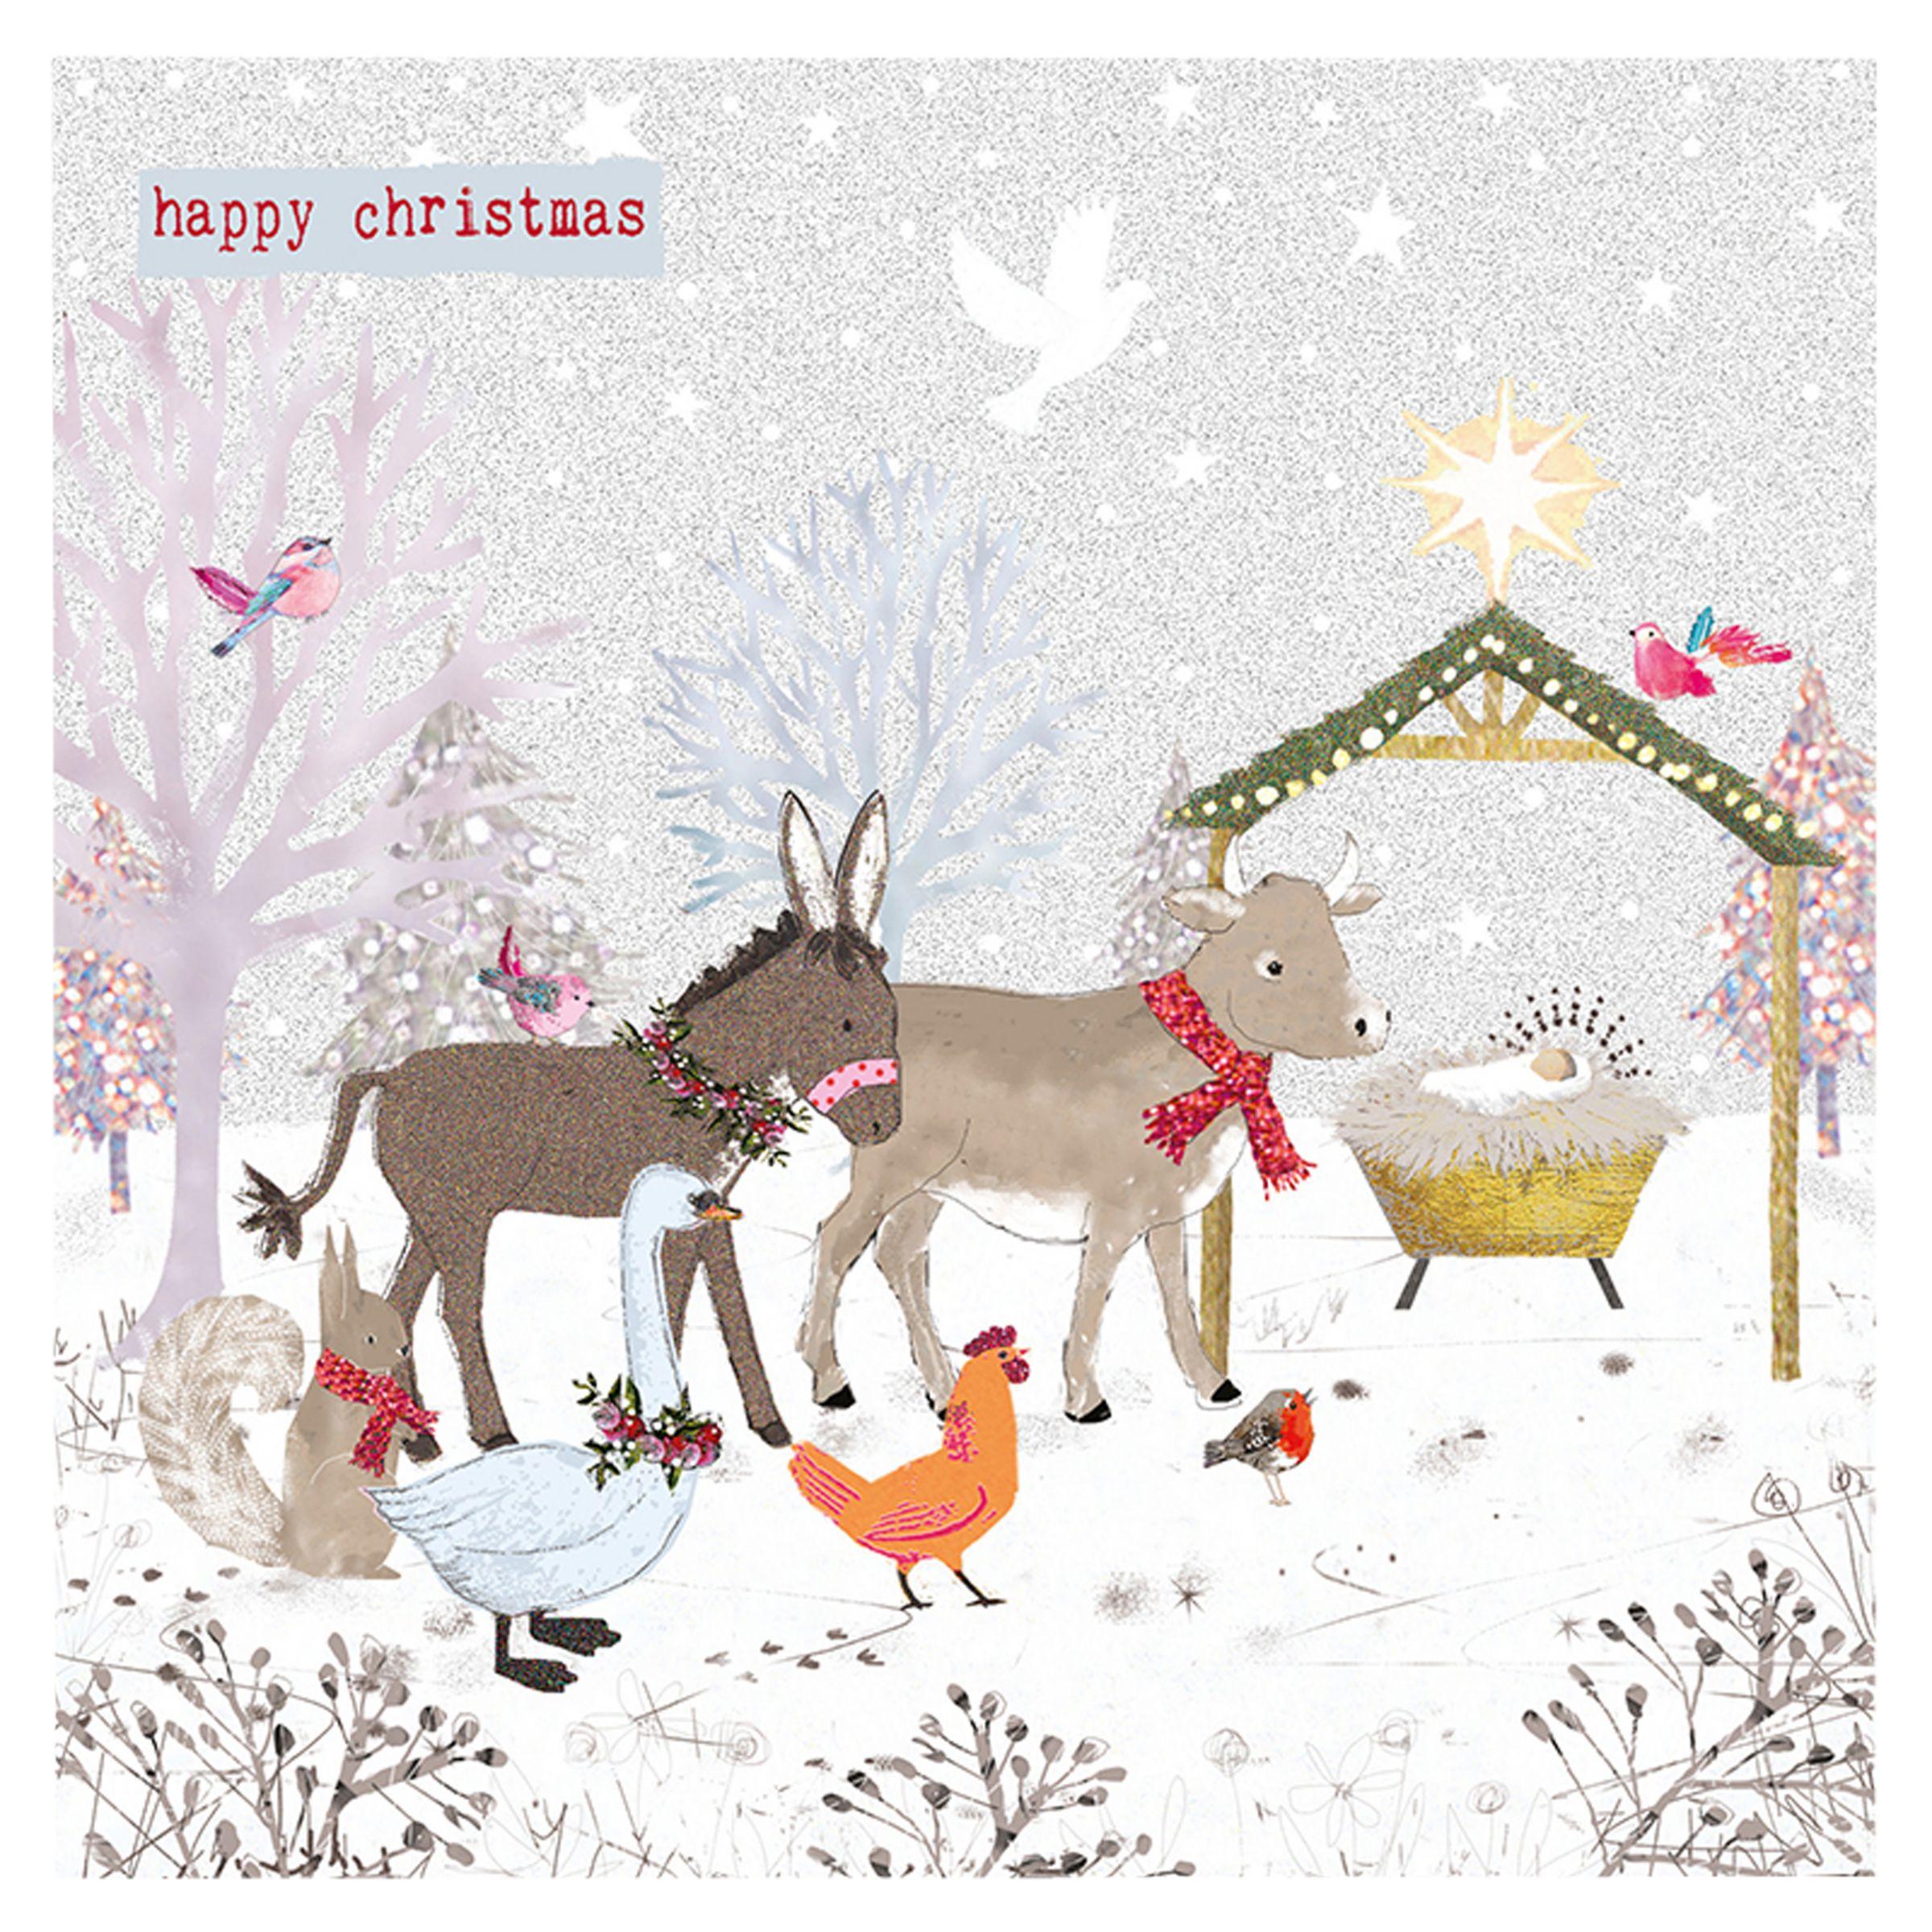 Hammond Gower Hammond Gower Animal Nativity Charity Christmas Cards, Pack of 5